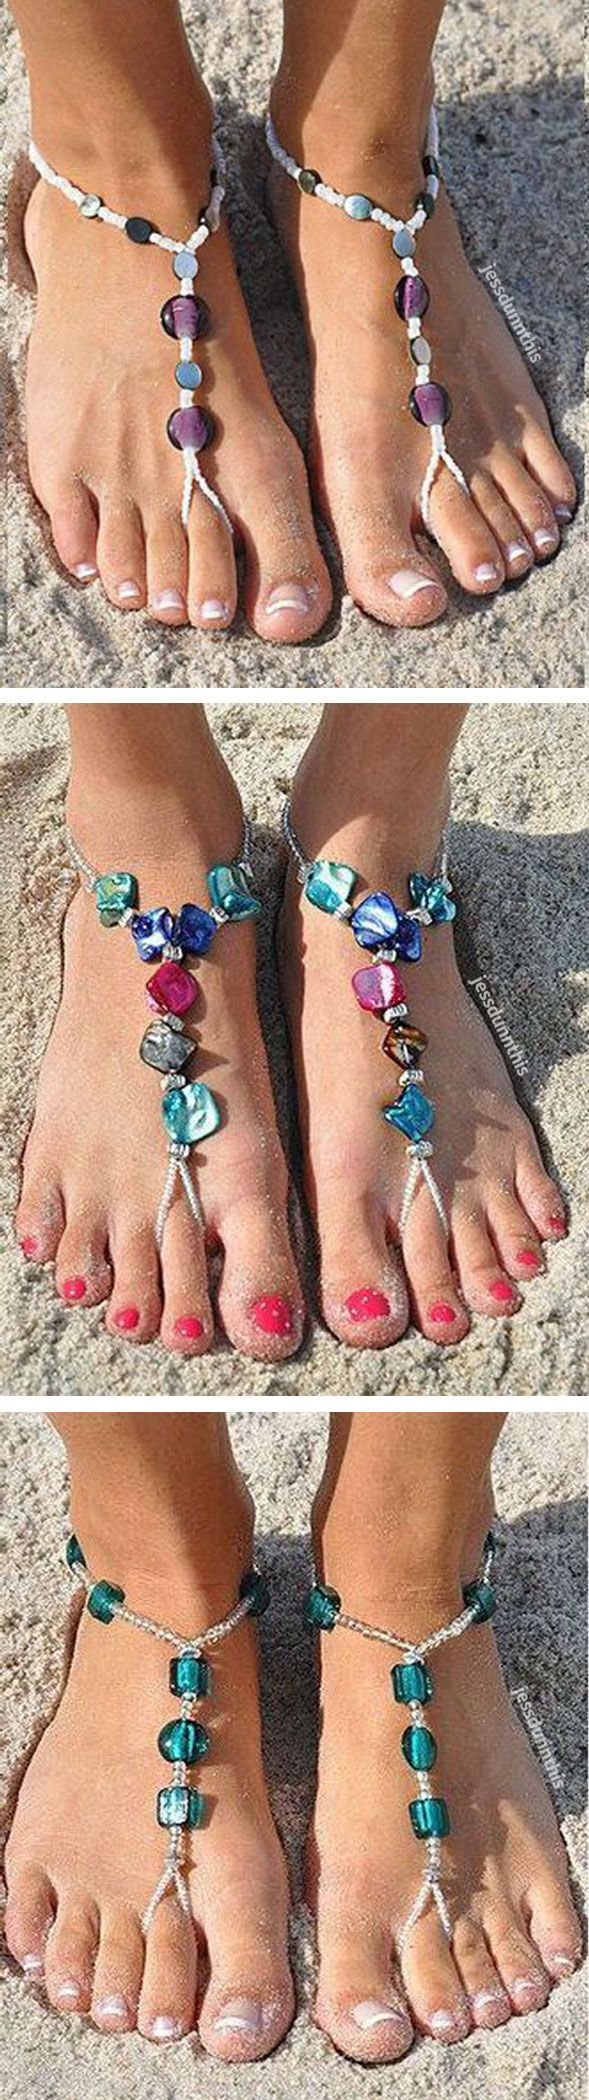 1019 best Barfu Sandalen images on Pinterest Feet jewelry Anklet